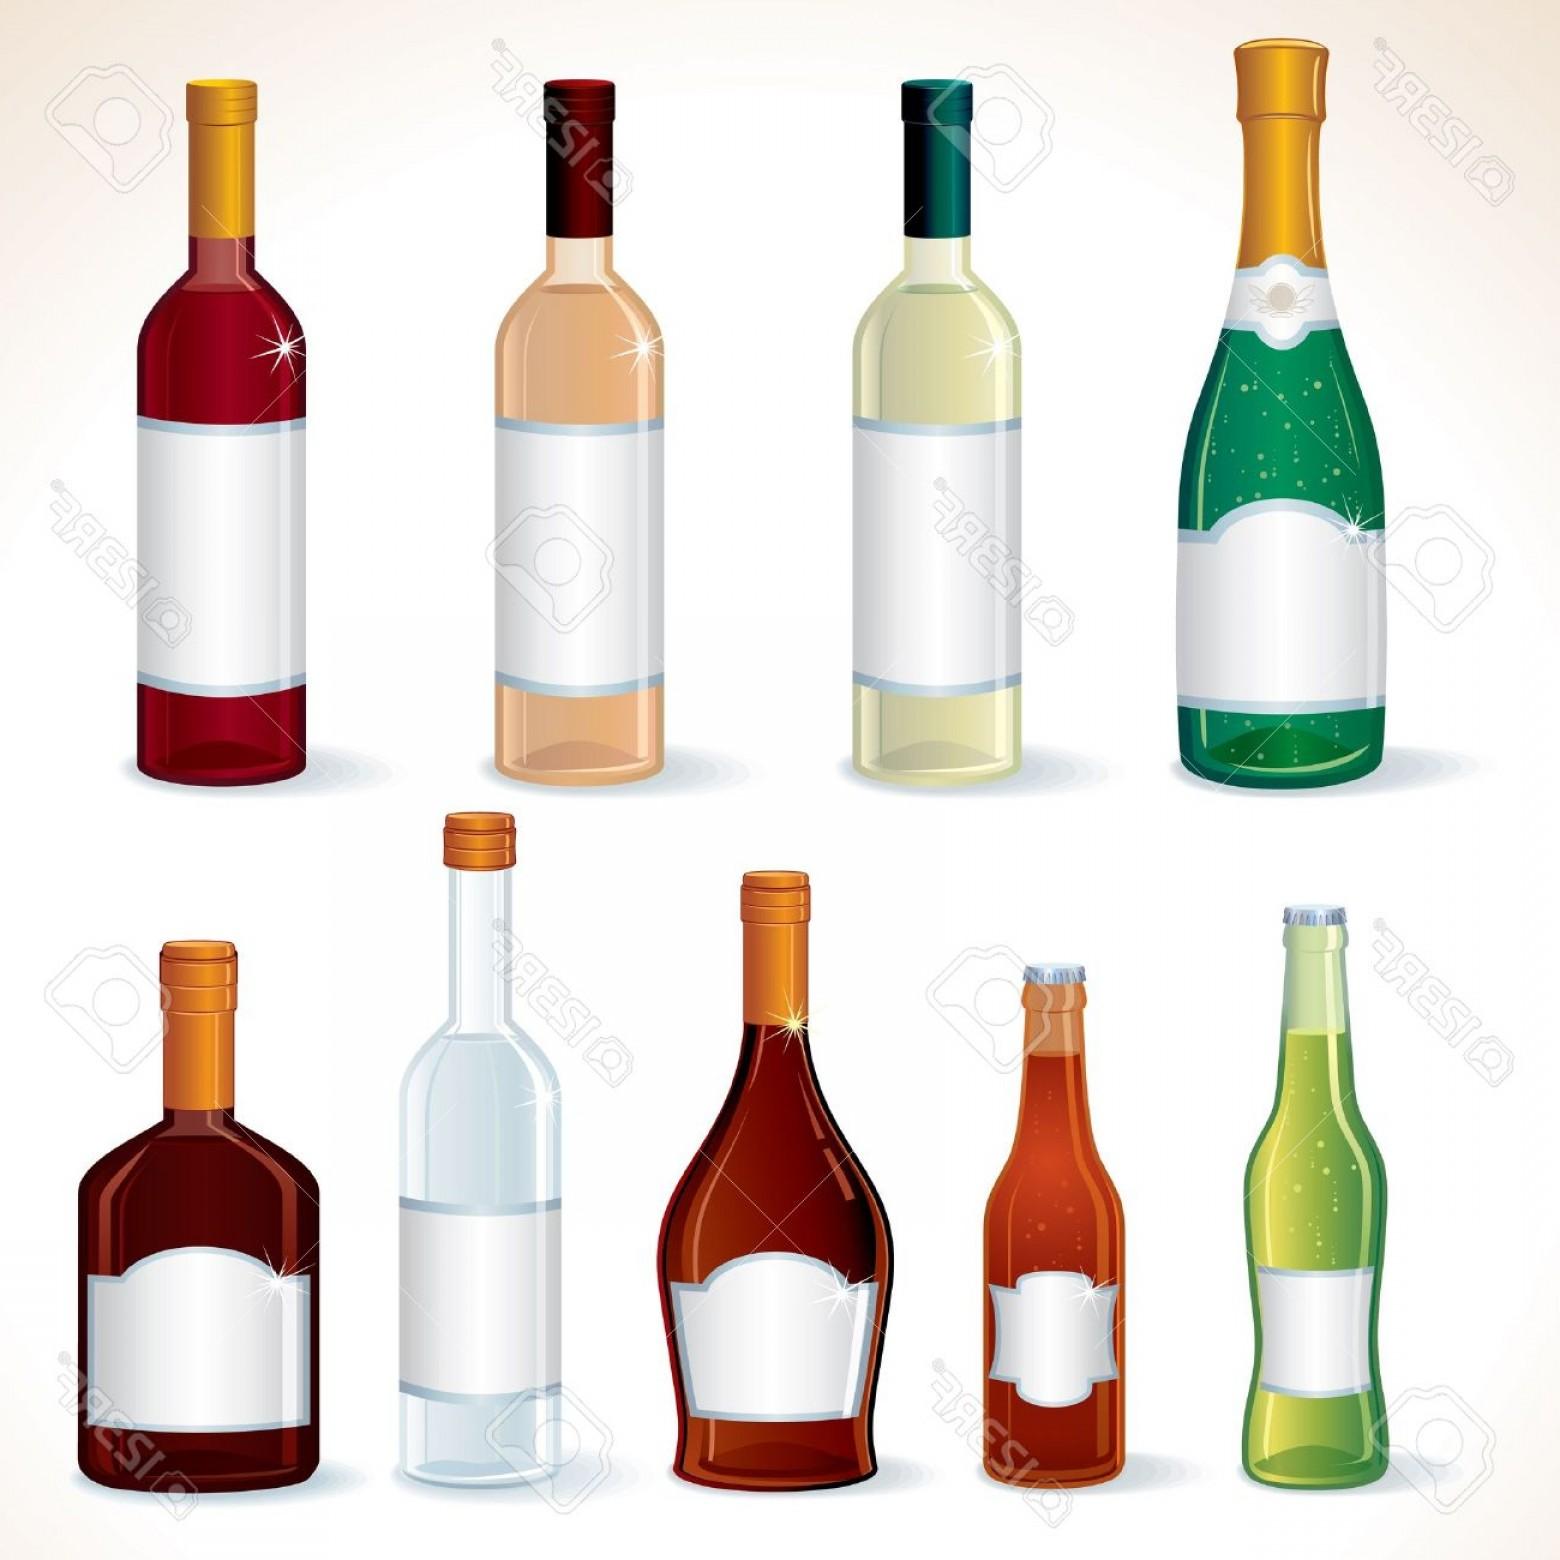 Photoglass Bottles With Various Alcoholic Drinks Vector Clip Art.